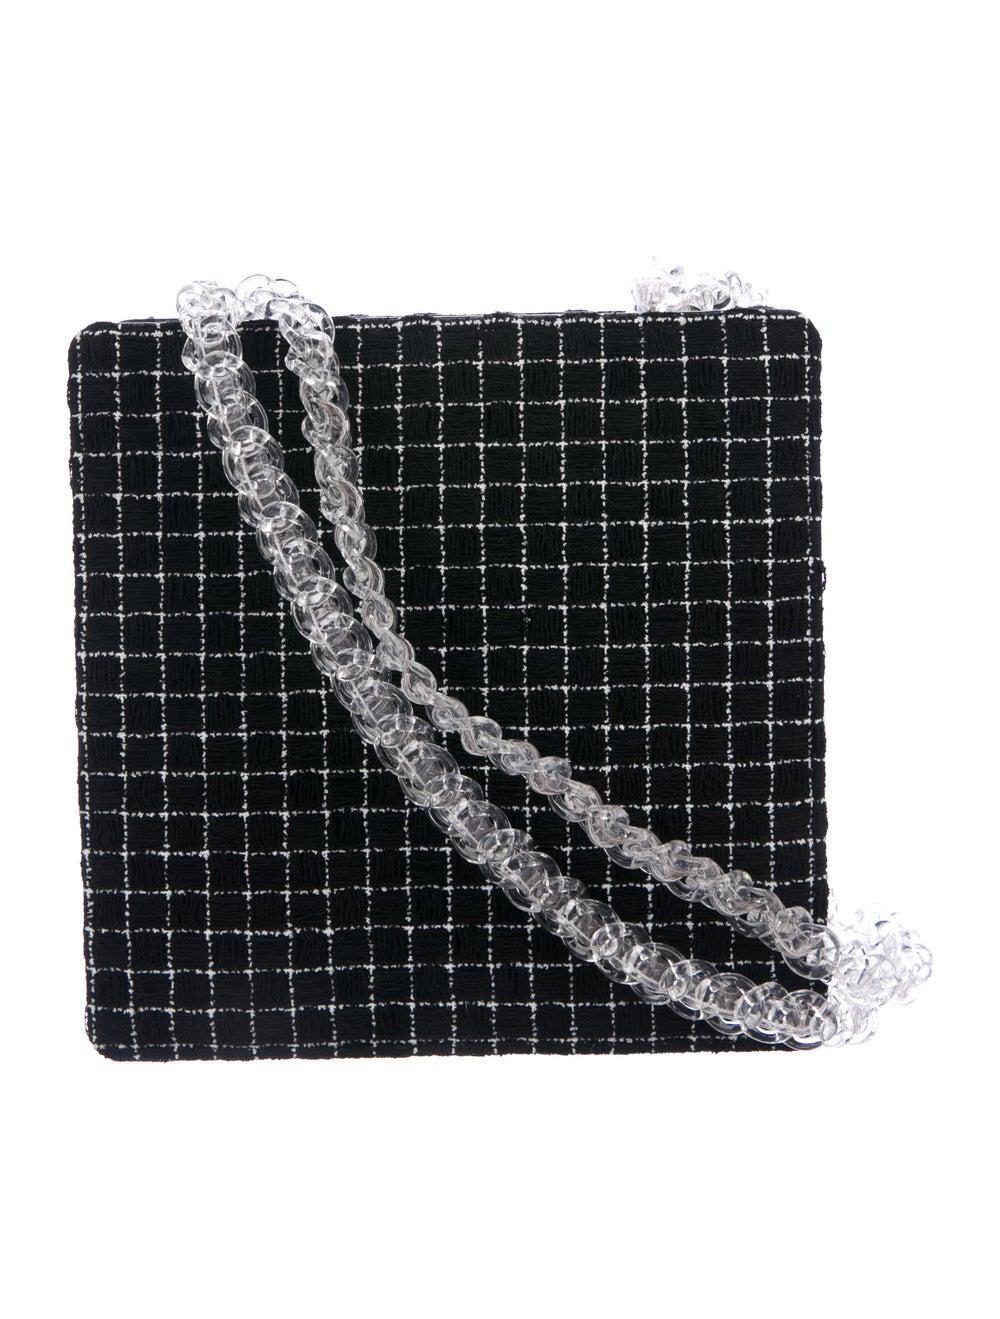 Chanel Chain Fantasy Tweed Bag Black - image 4